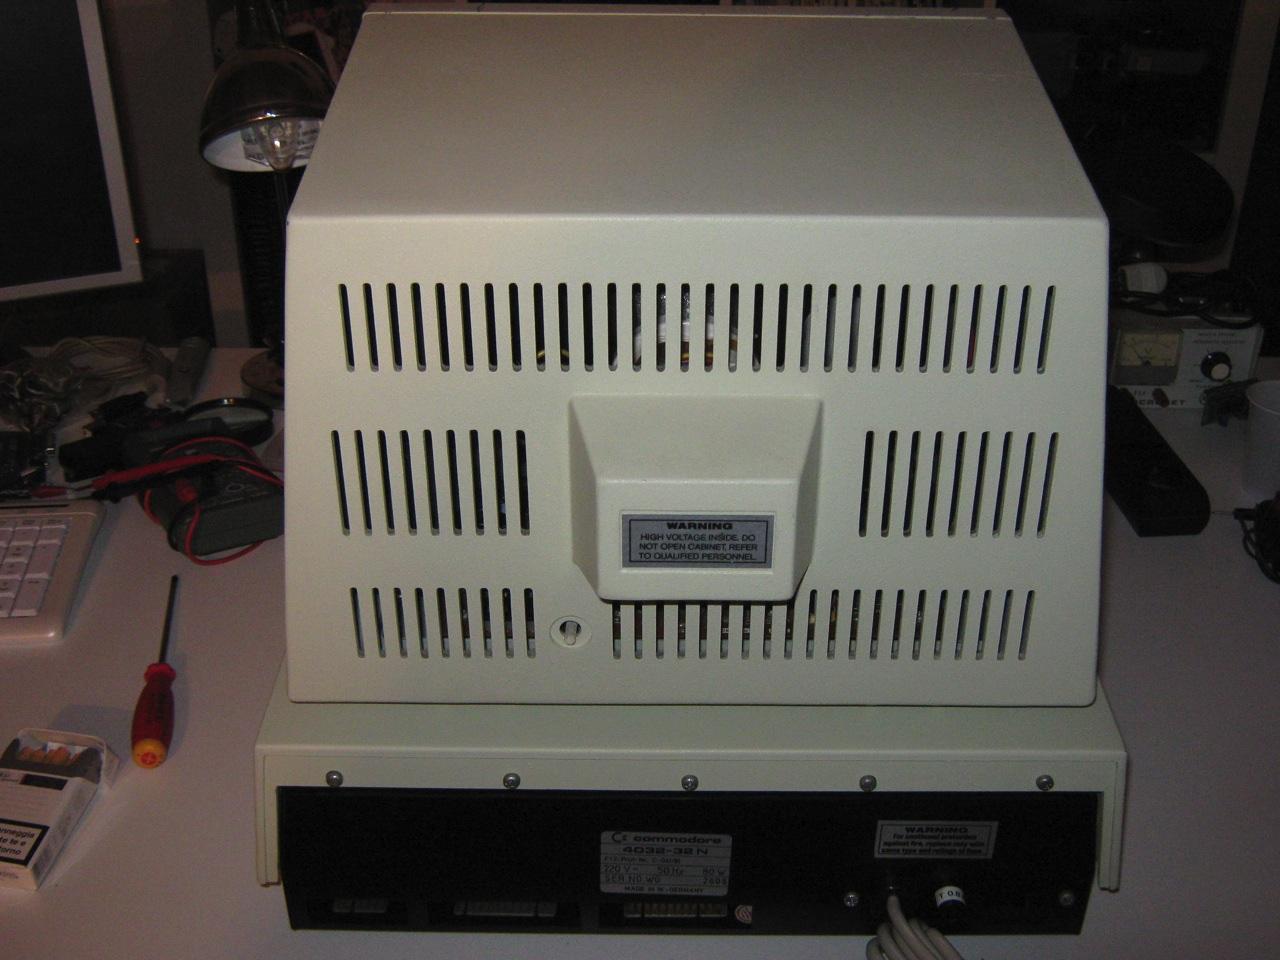 Commodore PET 4032 (Fat 40) | nIGHTFALL Blog / RetroComputerMania.com